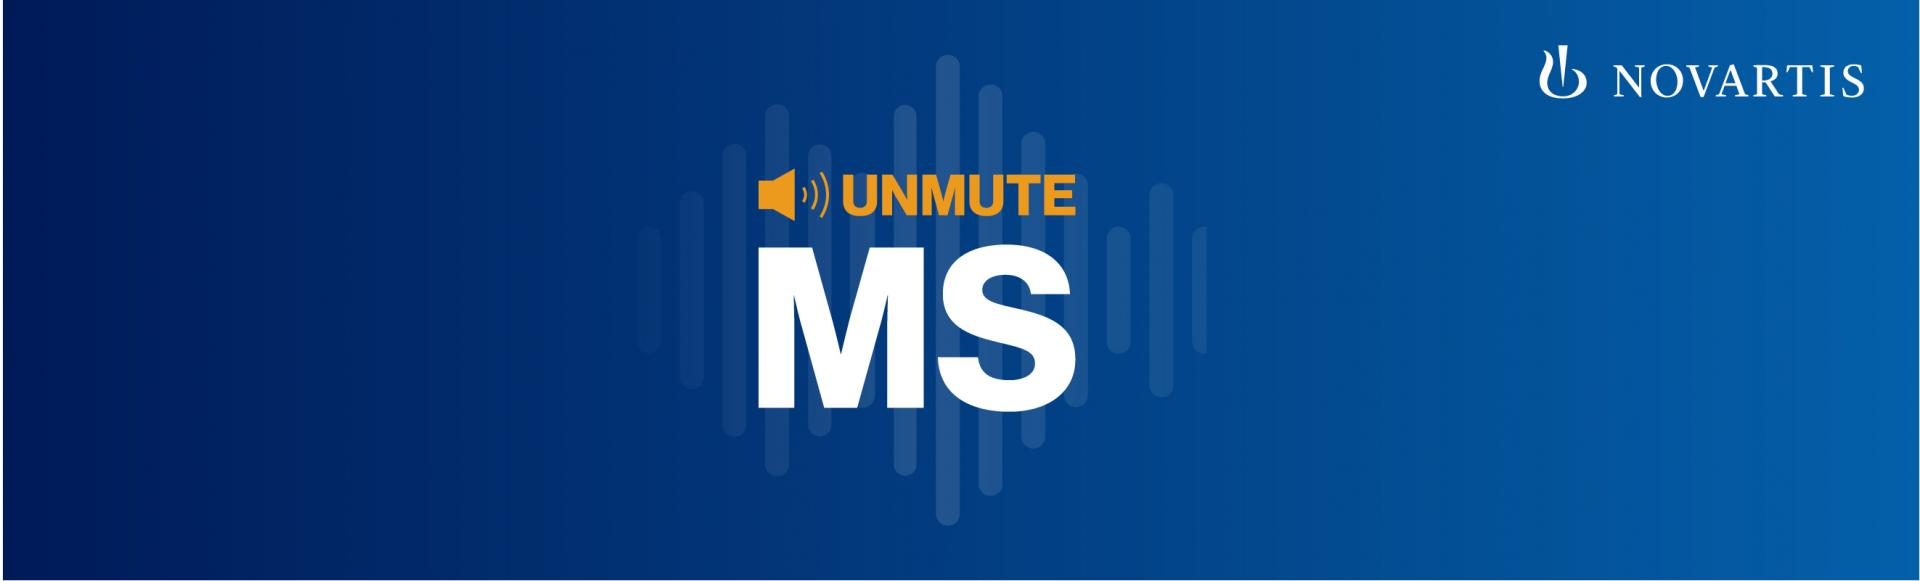 Novartis Unmute MS